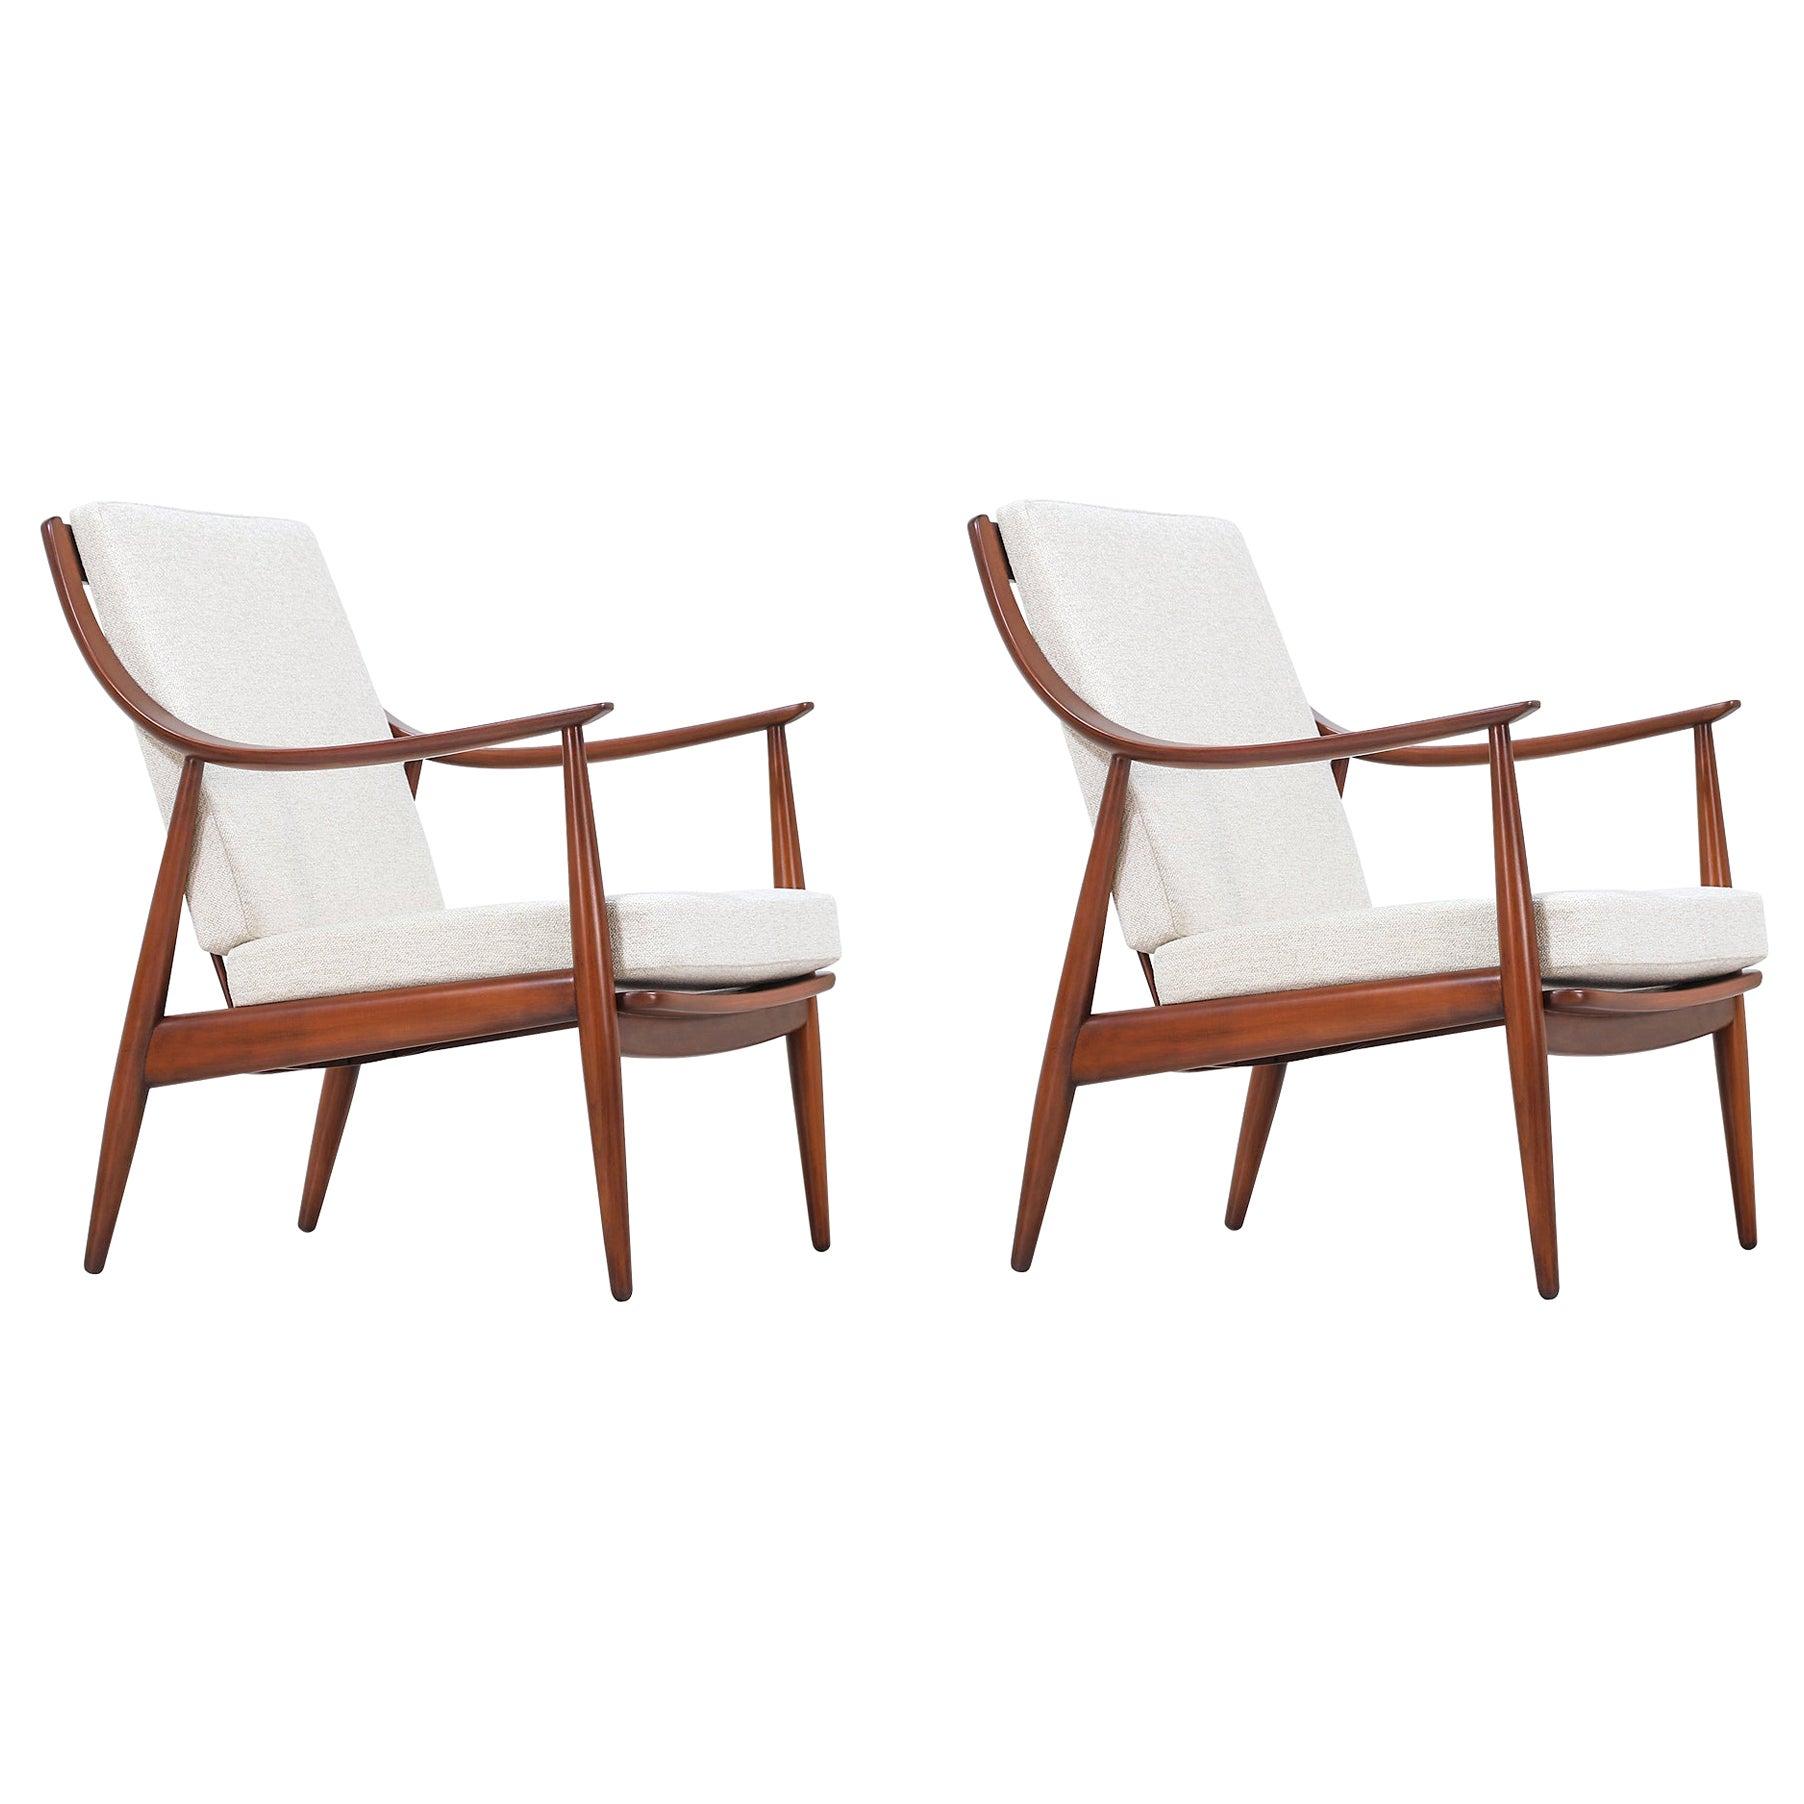 Peter Hvidt & Orla Mølgaard-Nielsen Model FD-146 Lounge Chairs